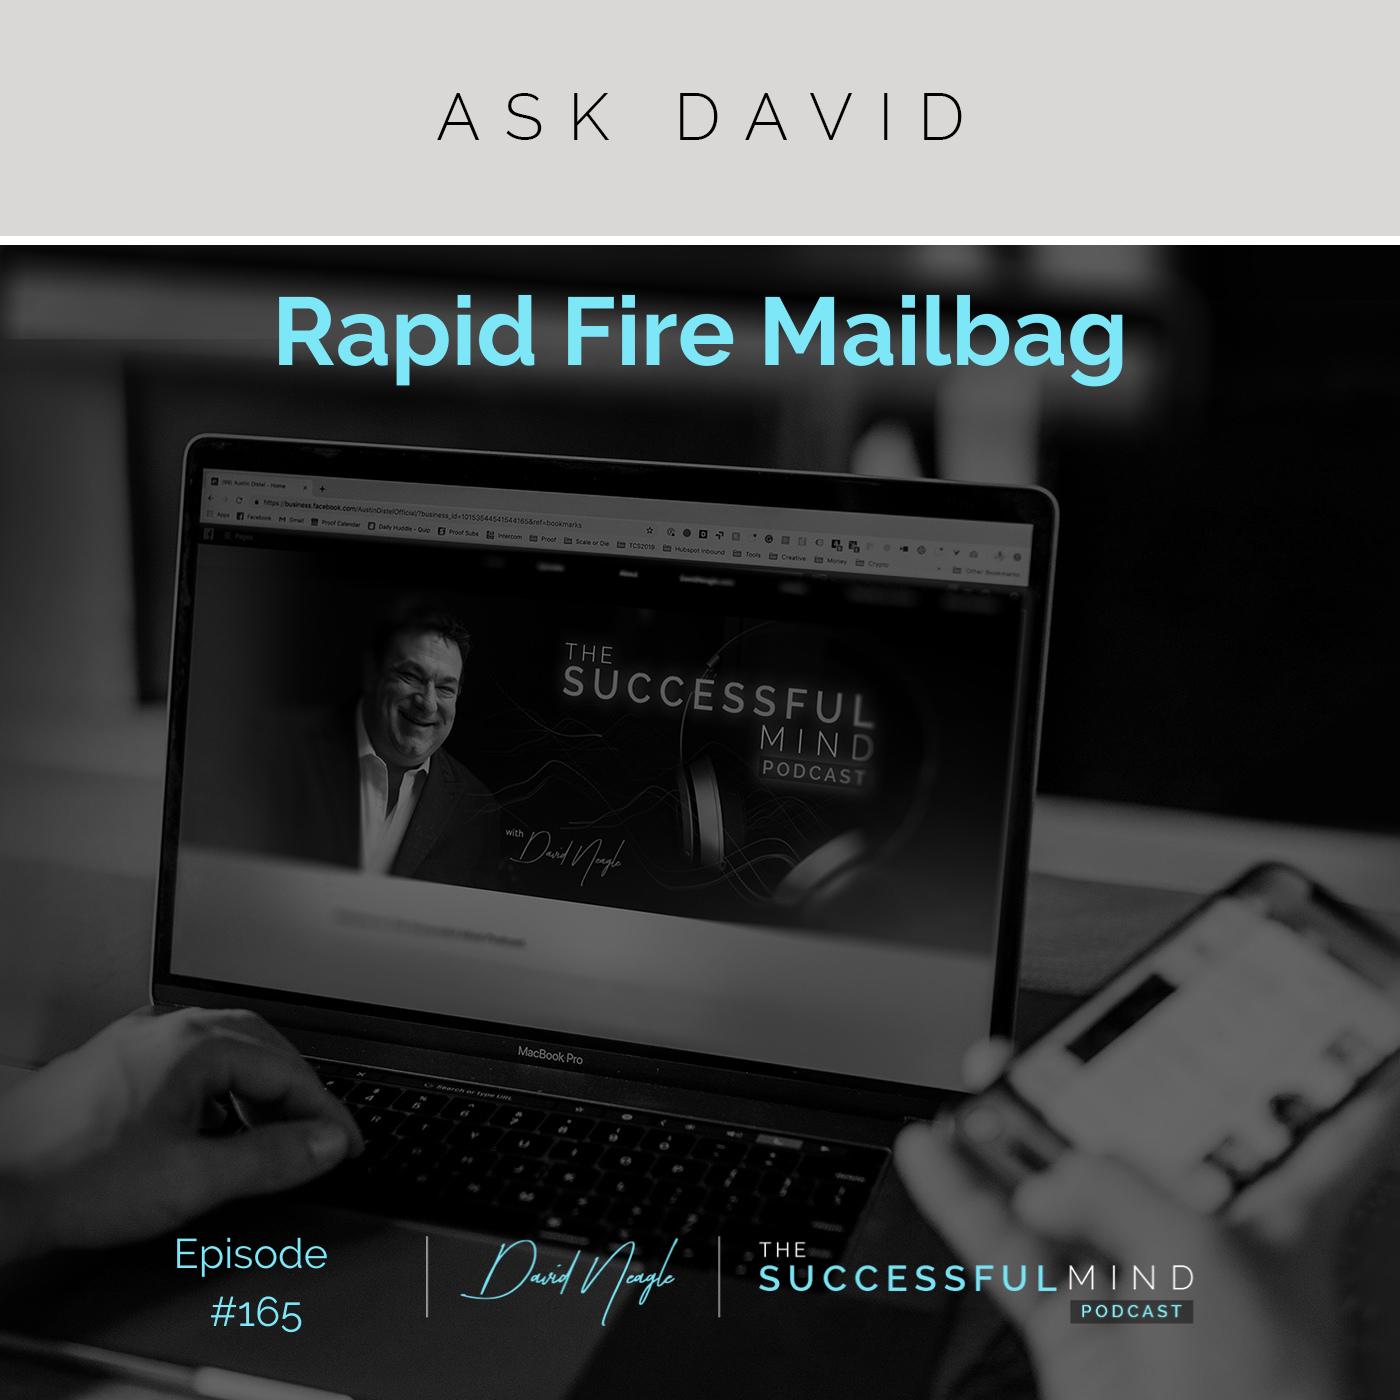 Episode 165: Ask David: Rapid Fire Mailbag